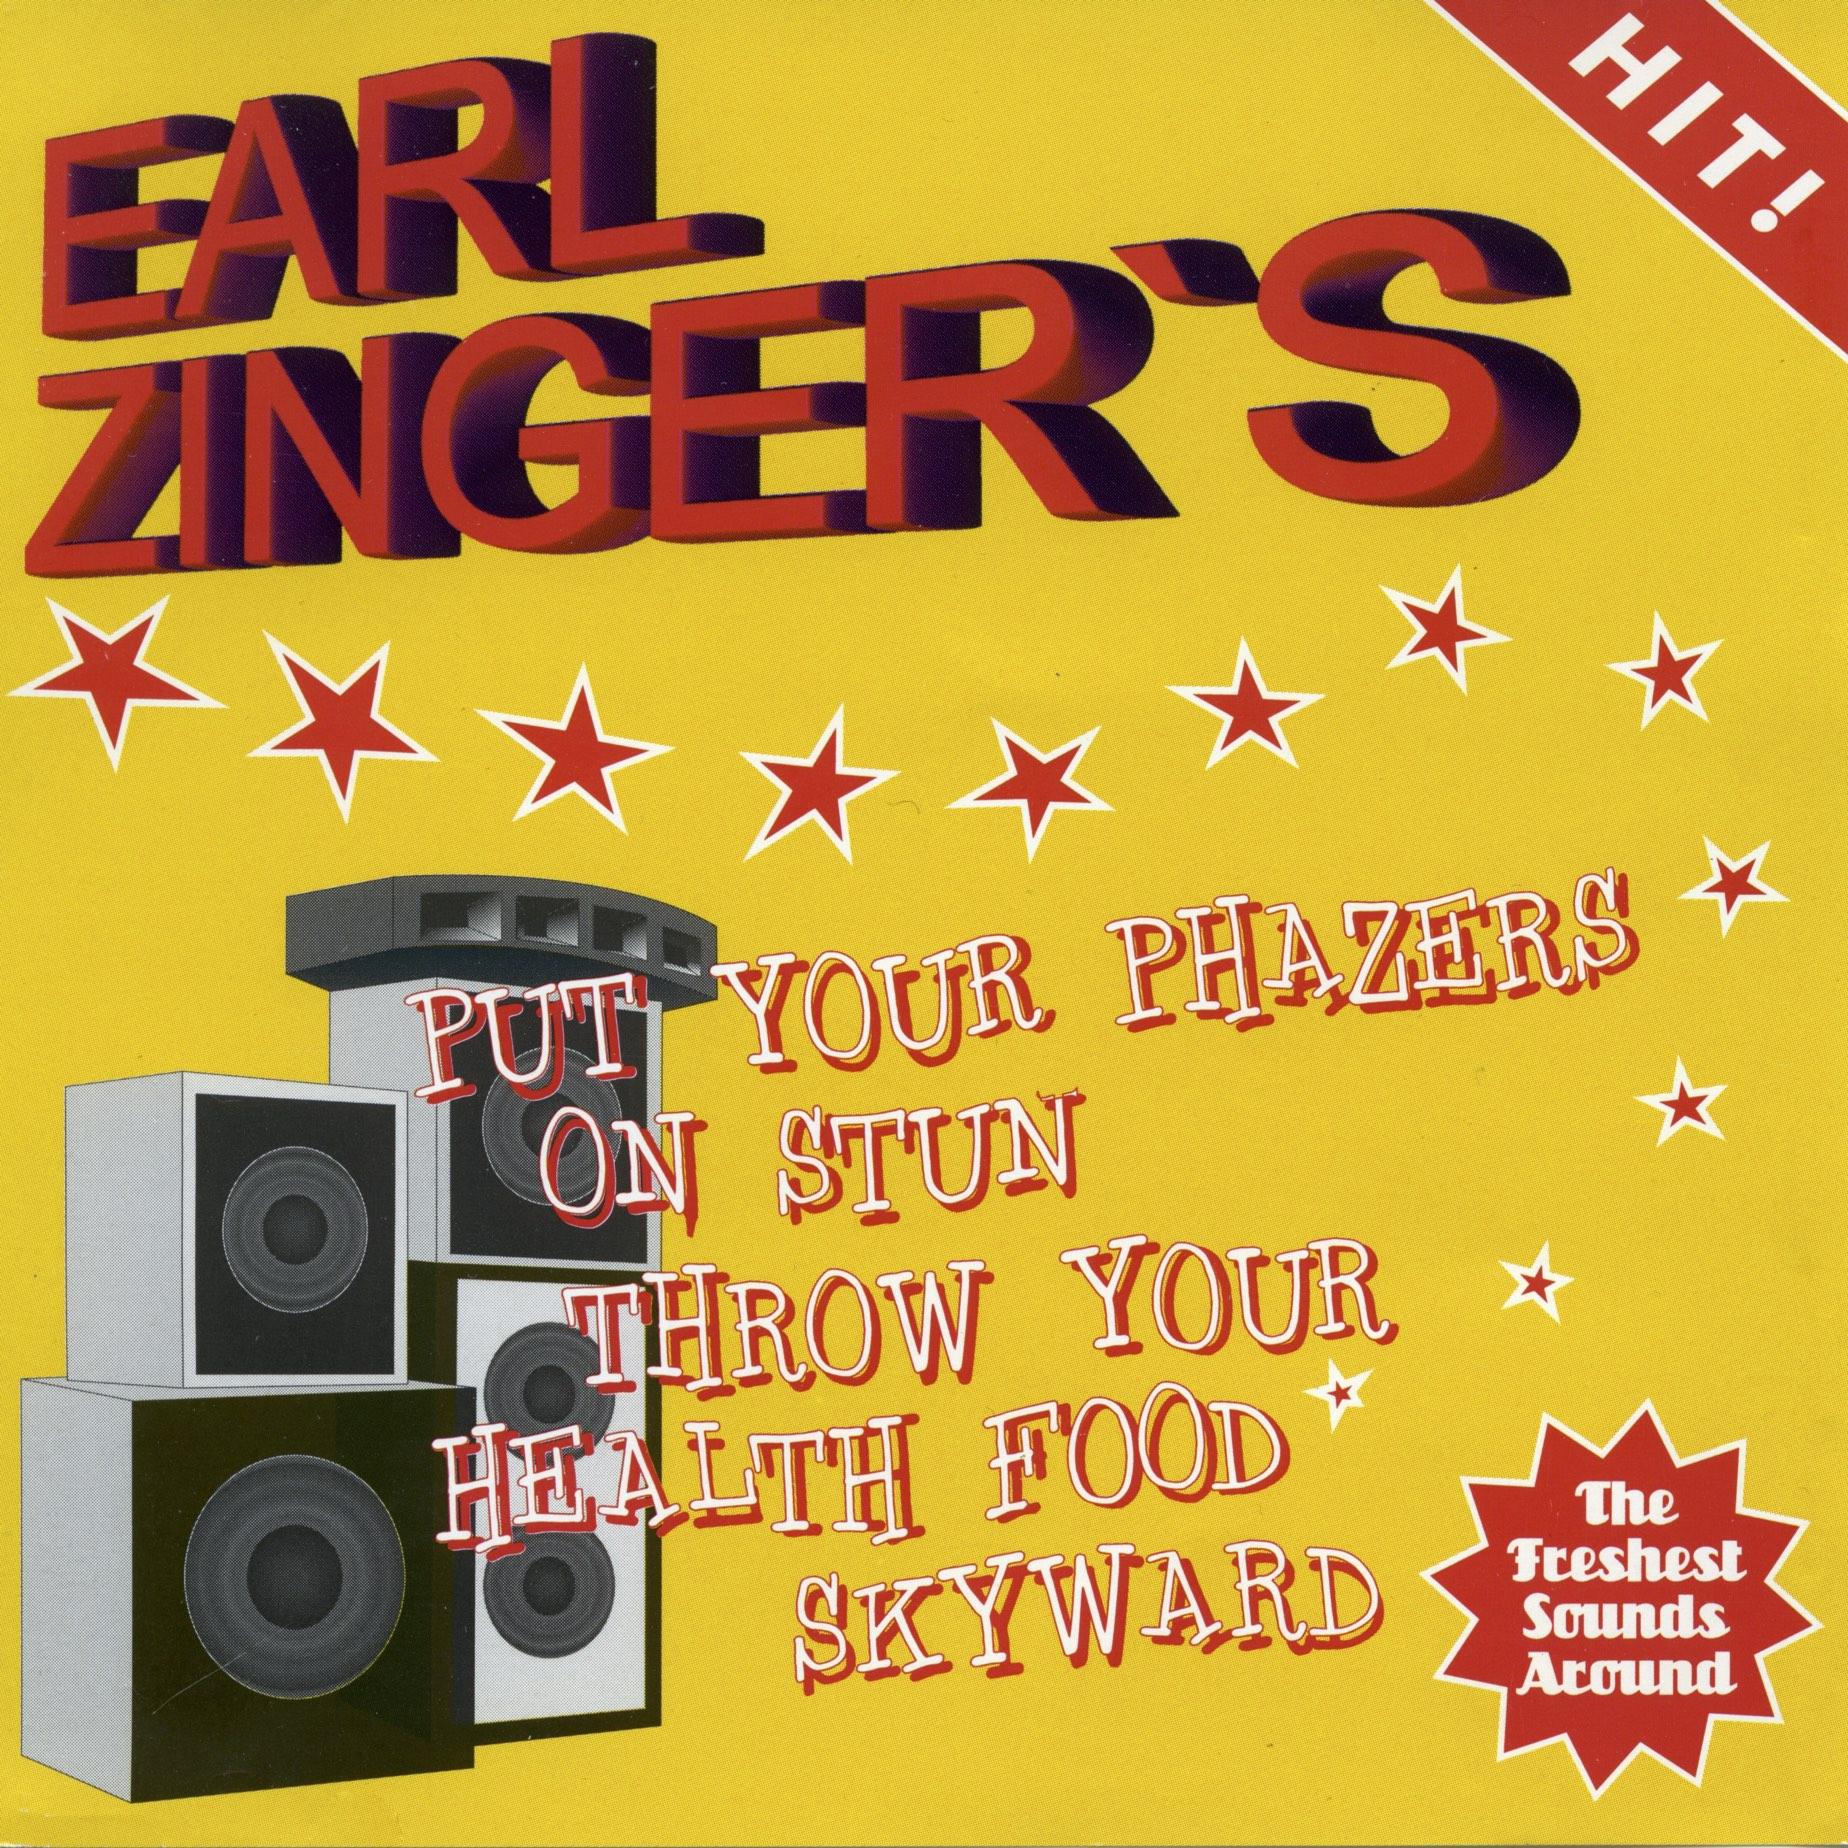 2002 - Earl Zingers